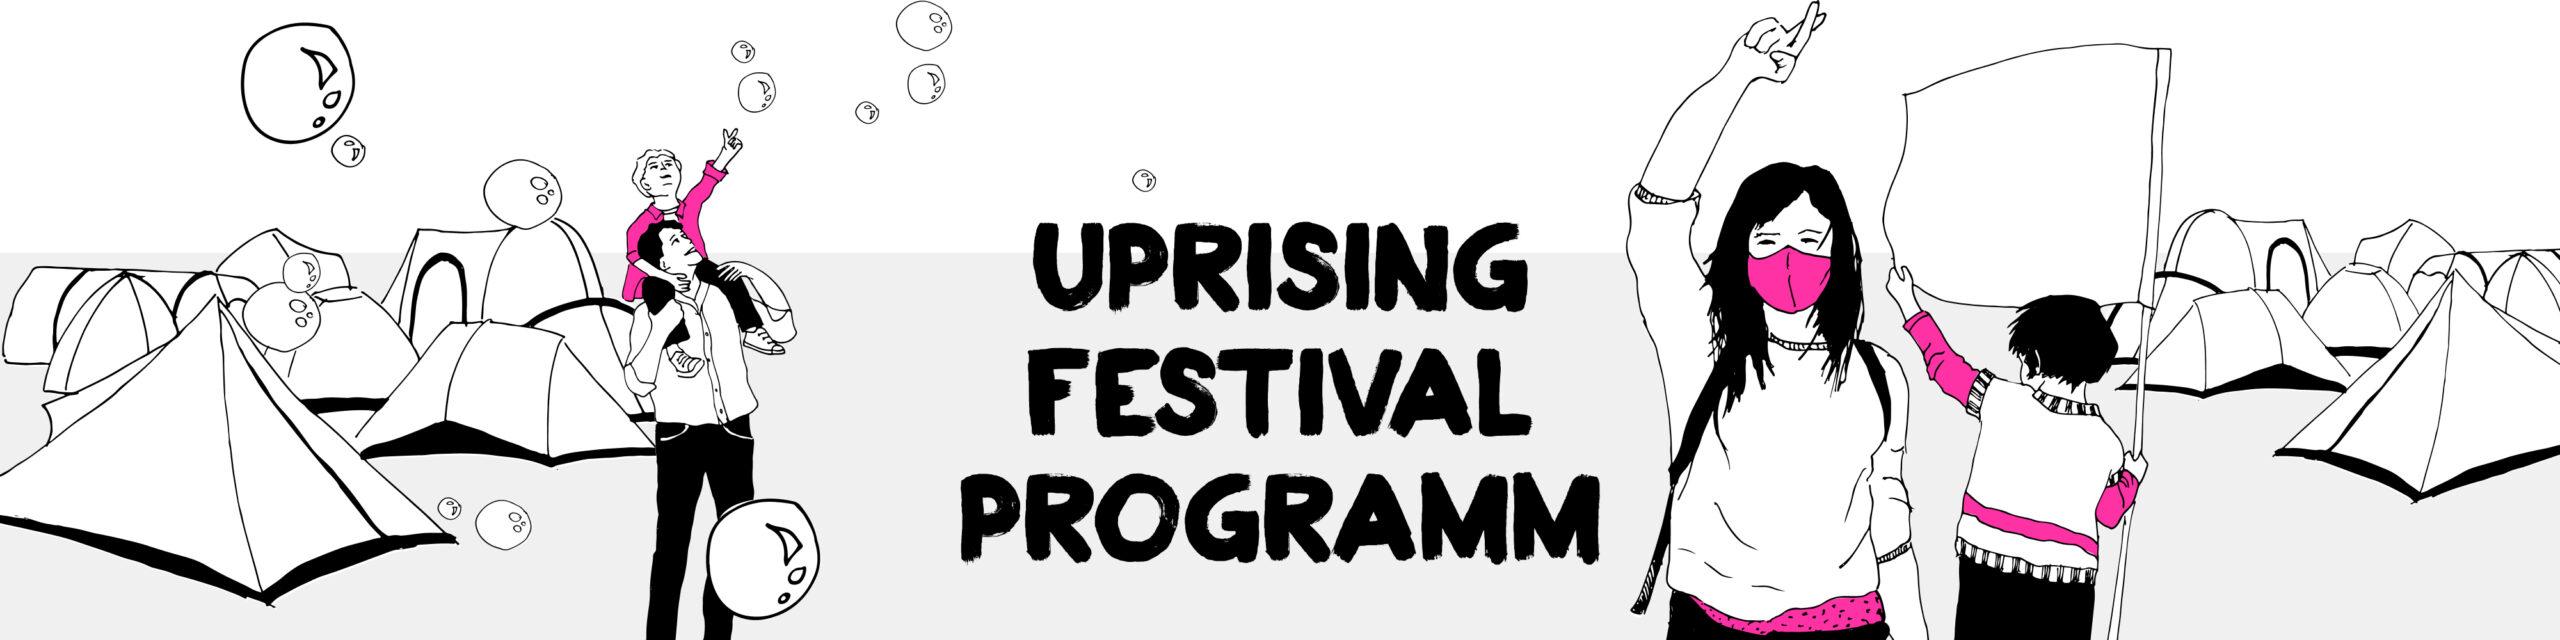 uprisingfestival-programm-header